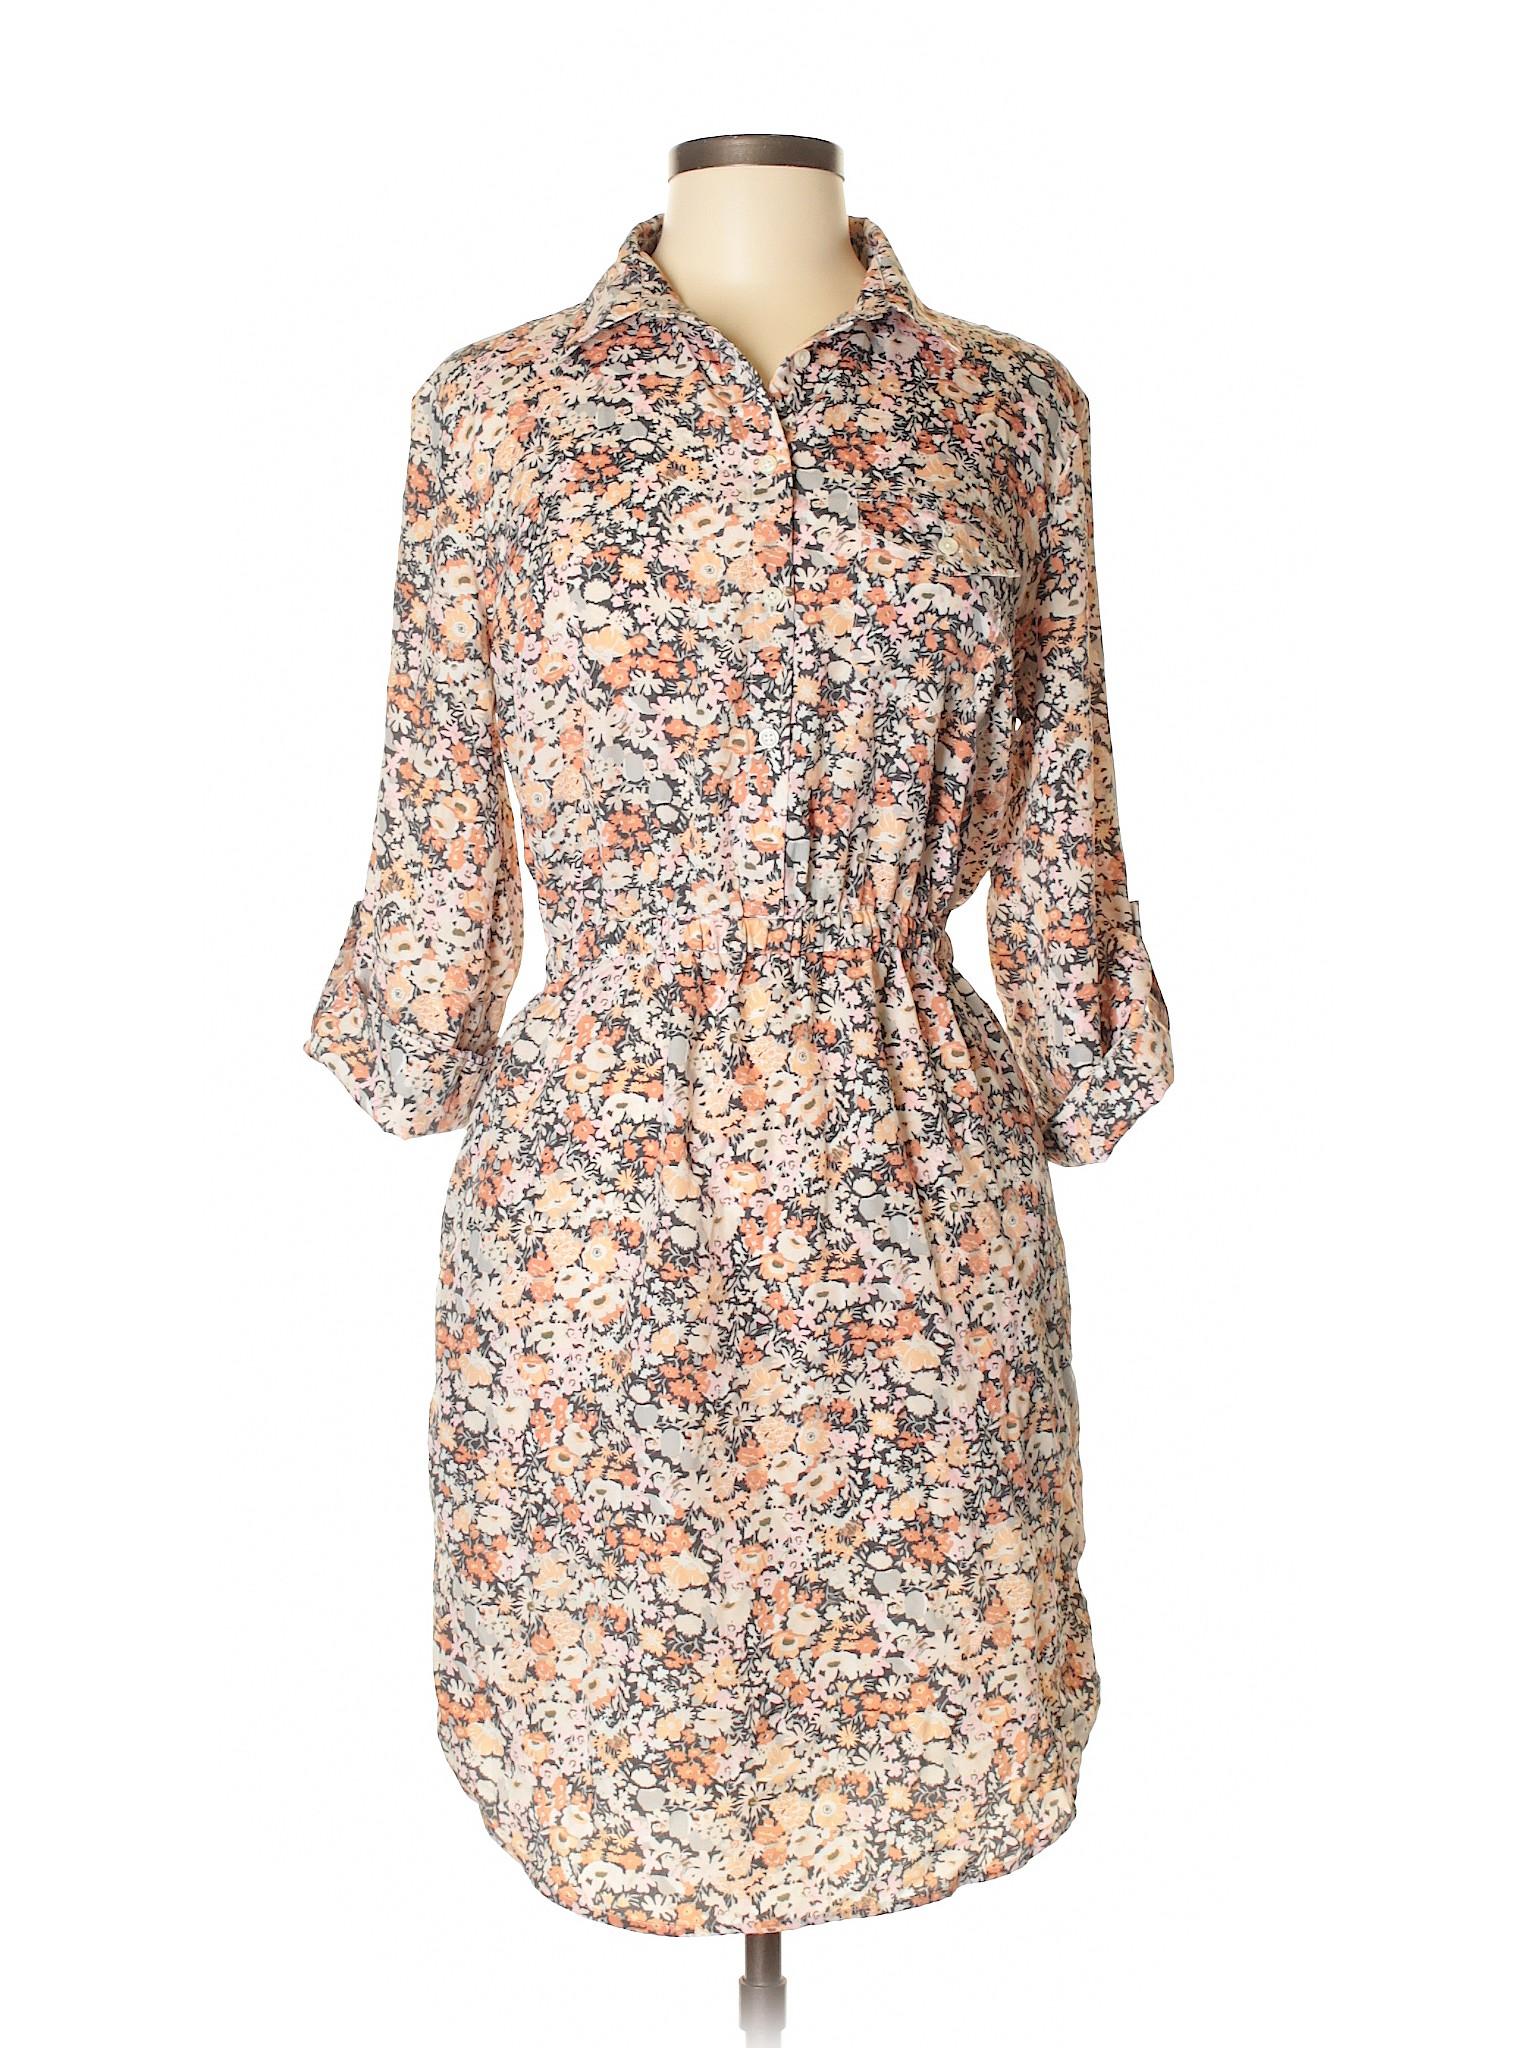 Boutique Dress Taylor Ann Casual LOFT winter BqBaTf